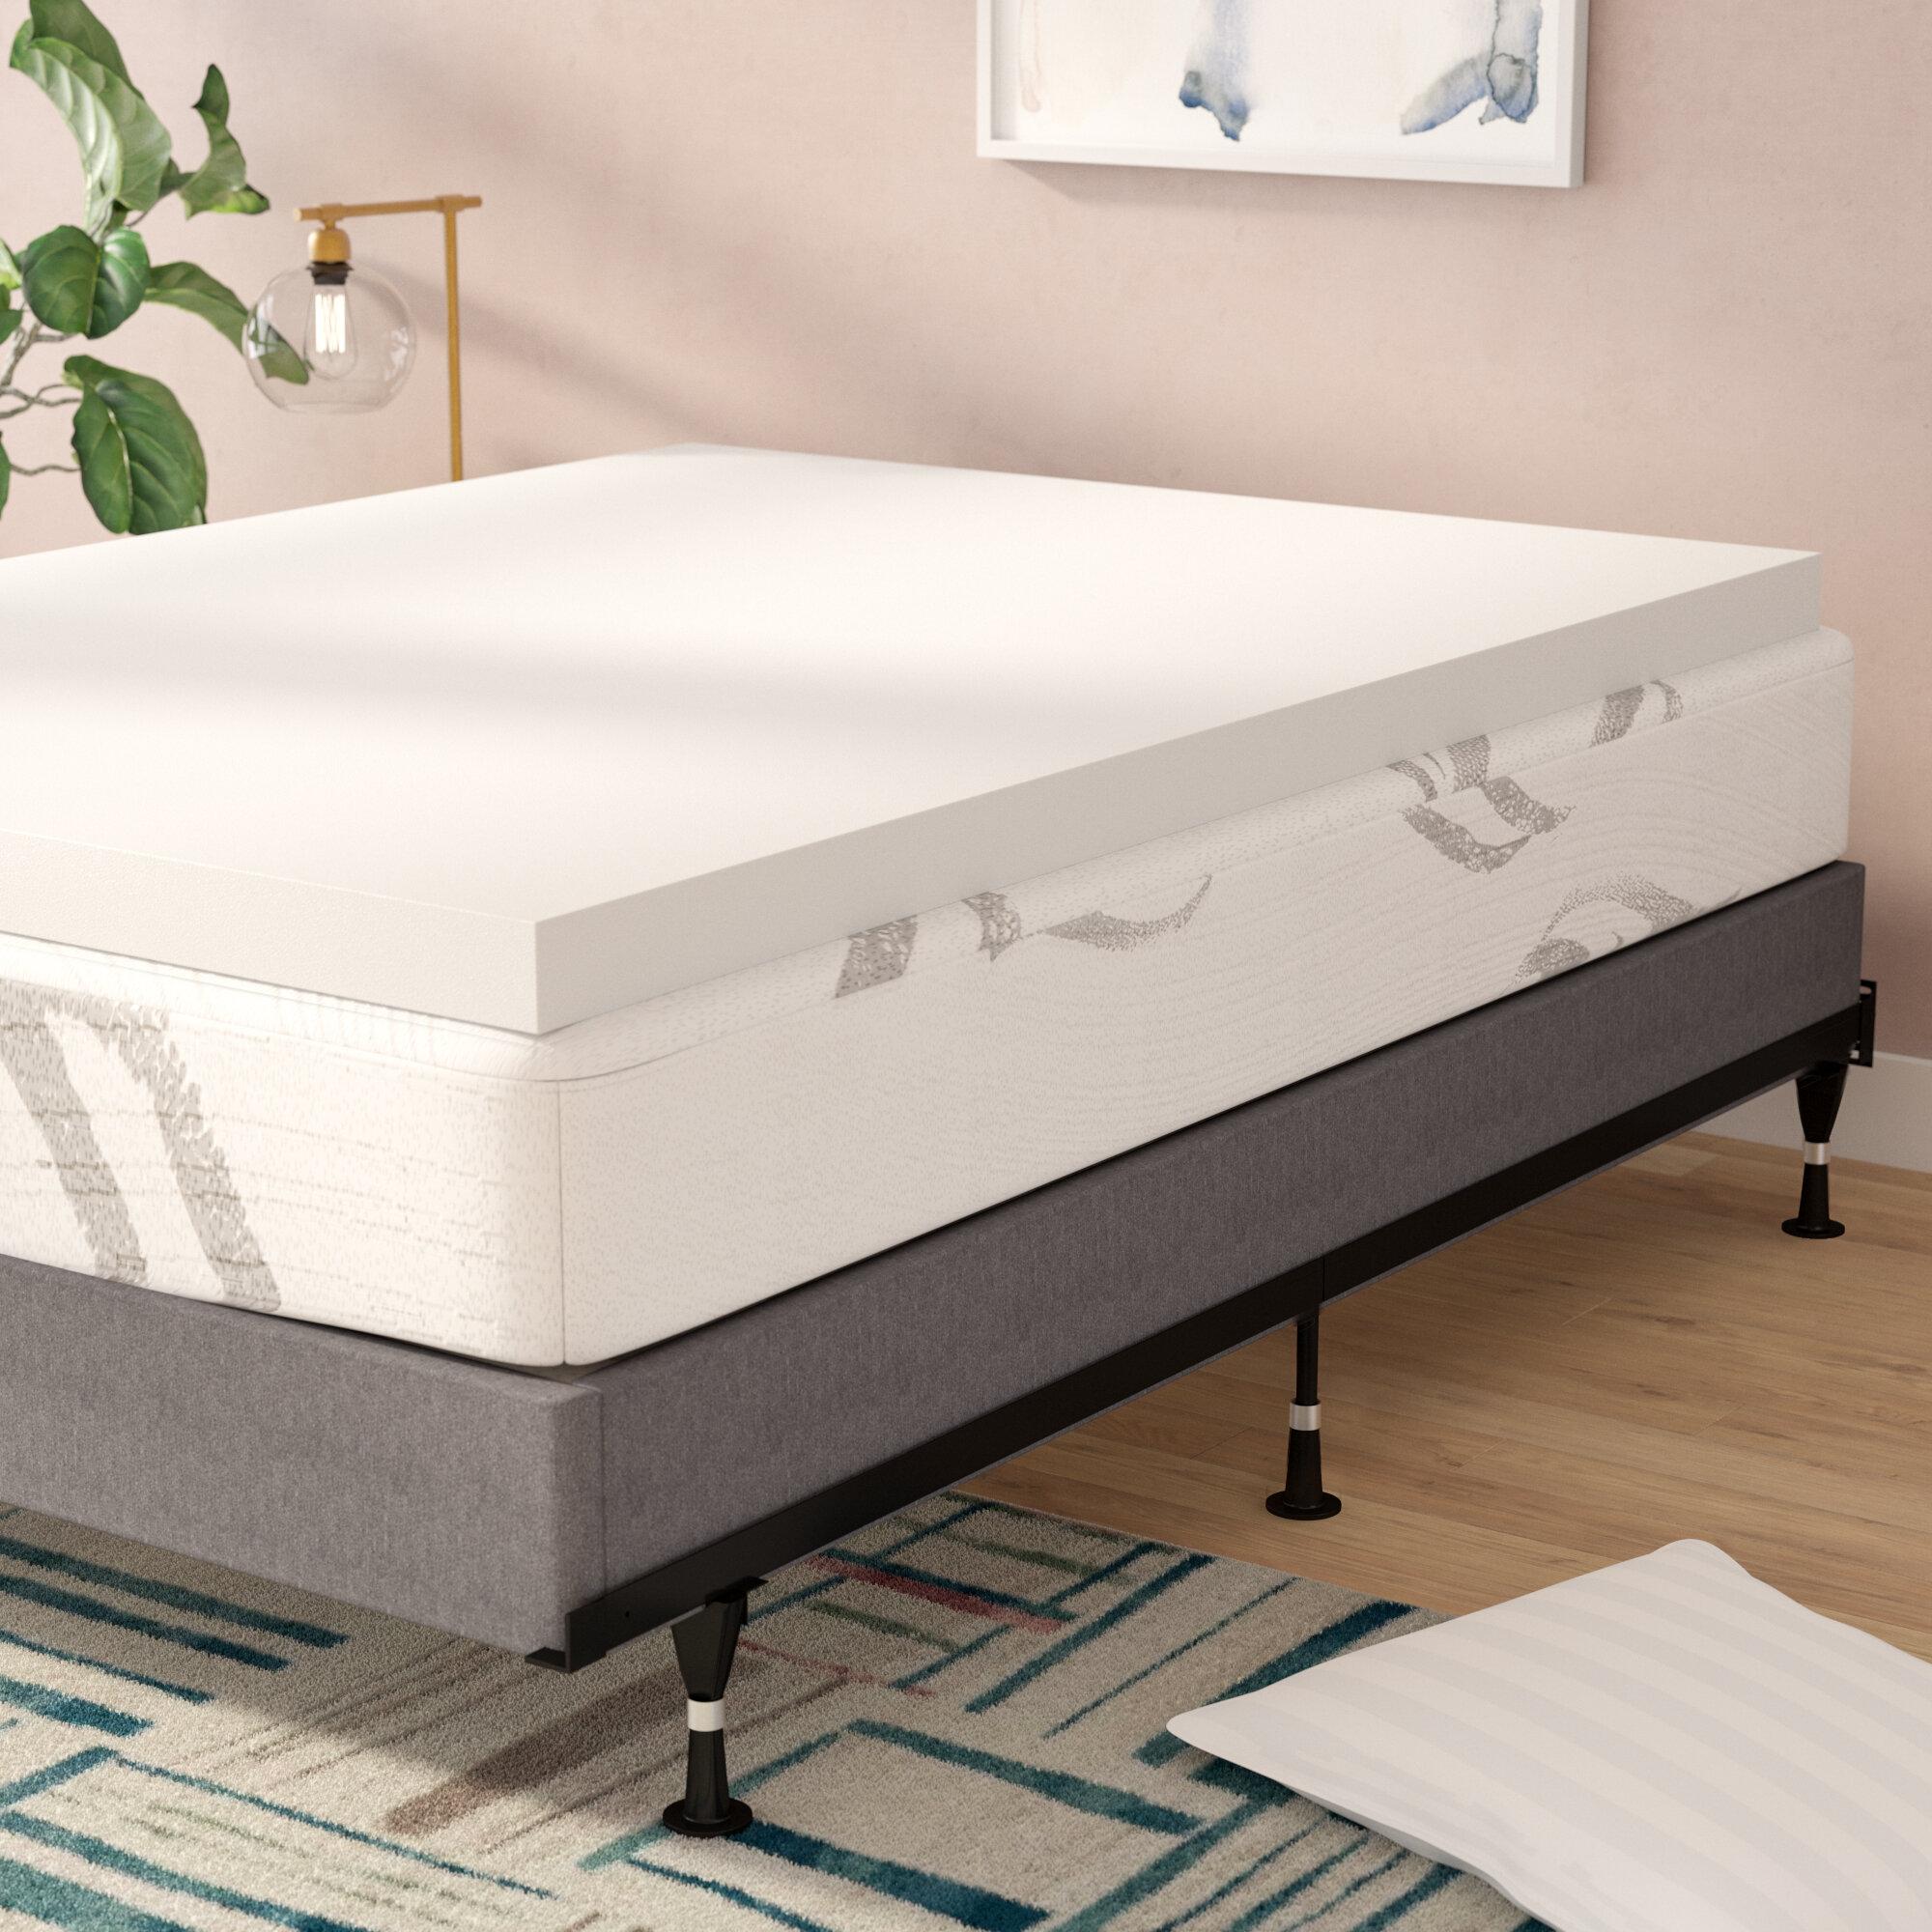 kitchen ca carpenter dp foam topper full memory home mattress amazon pad